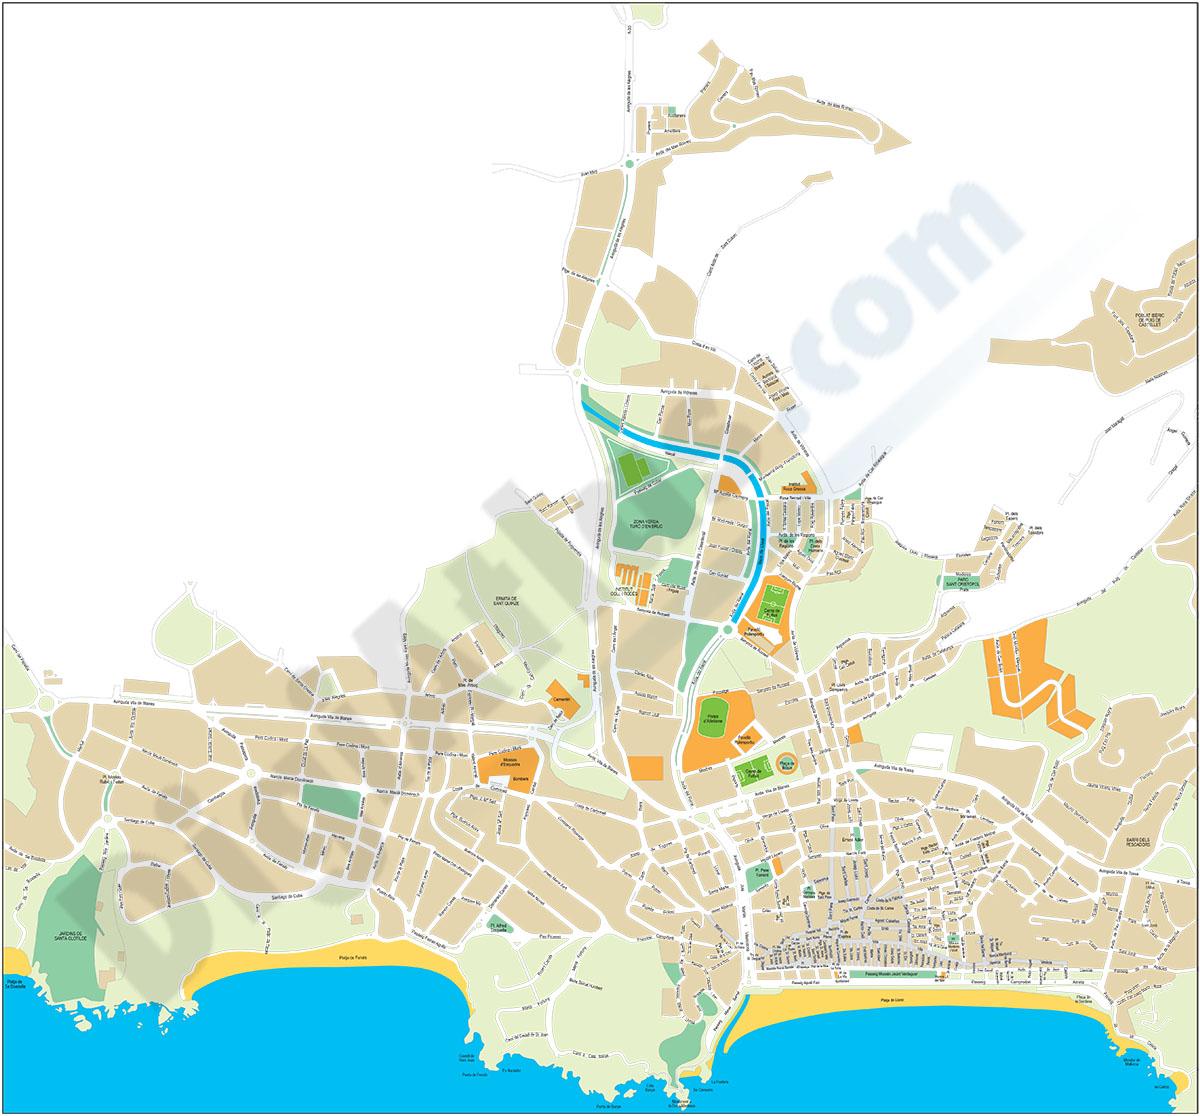 Lloret de Mar (Girona) - plano callejero